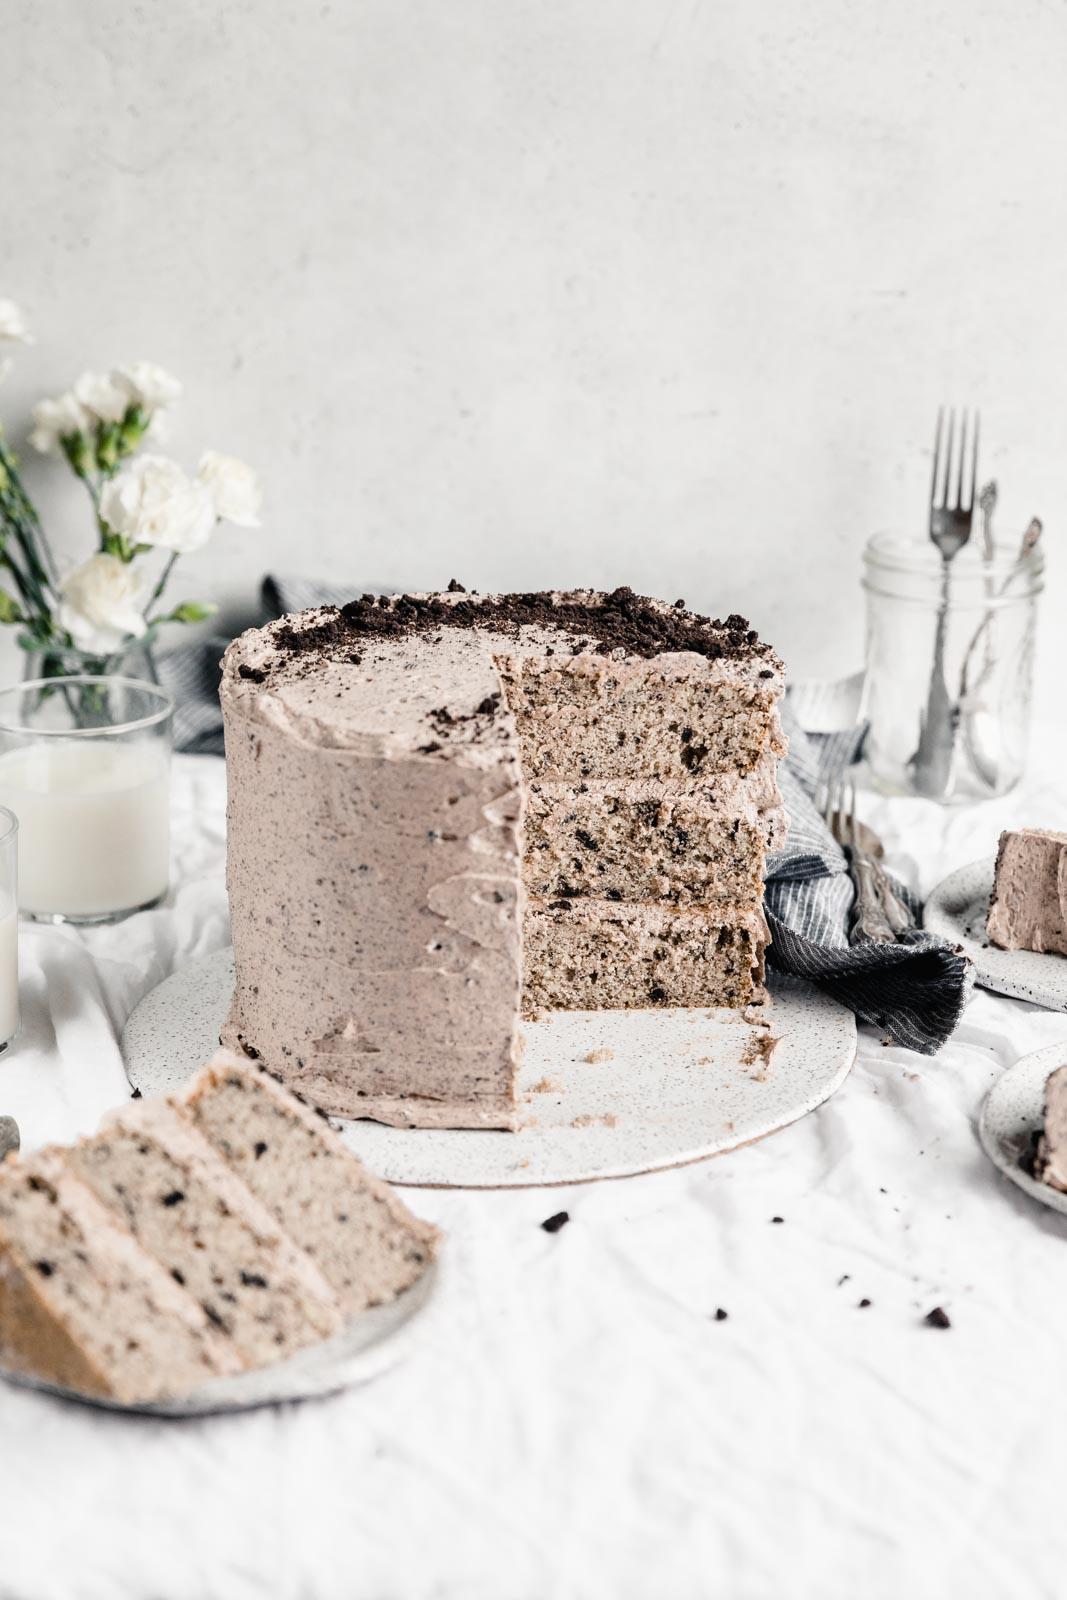 Sensational Oreo Cake With Coffee Oreo Buttercream Broma Bakery Funny Birthday Cards Online Hendilapandamsfinfo